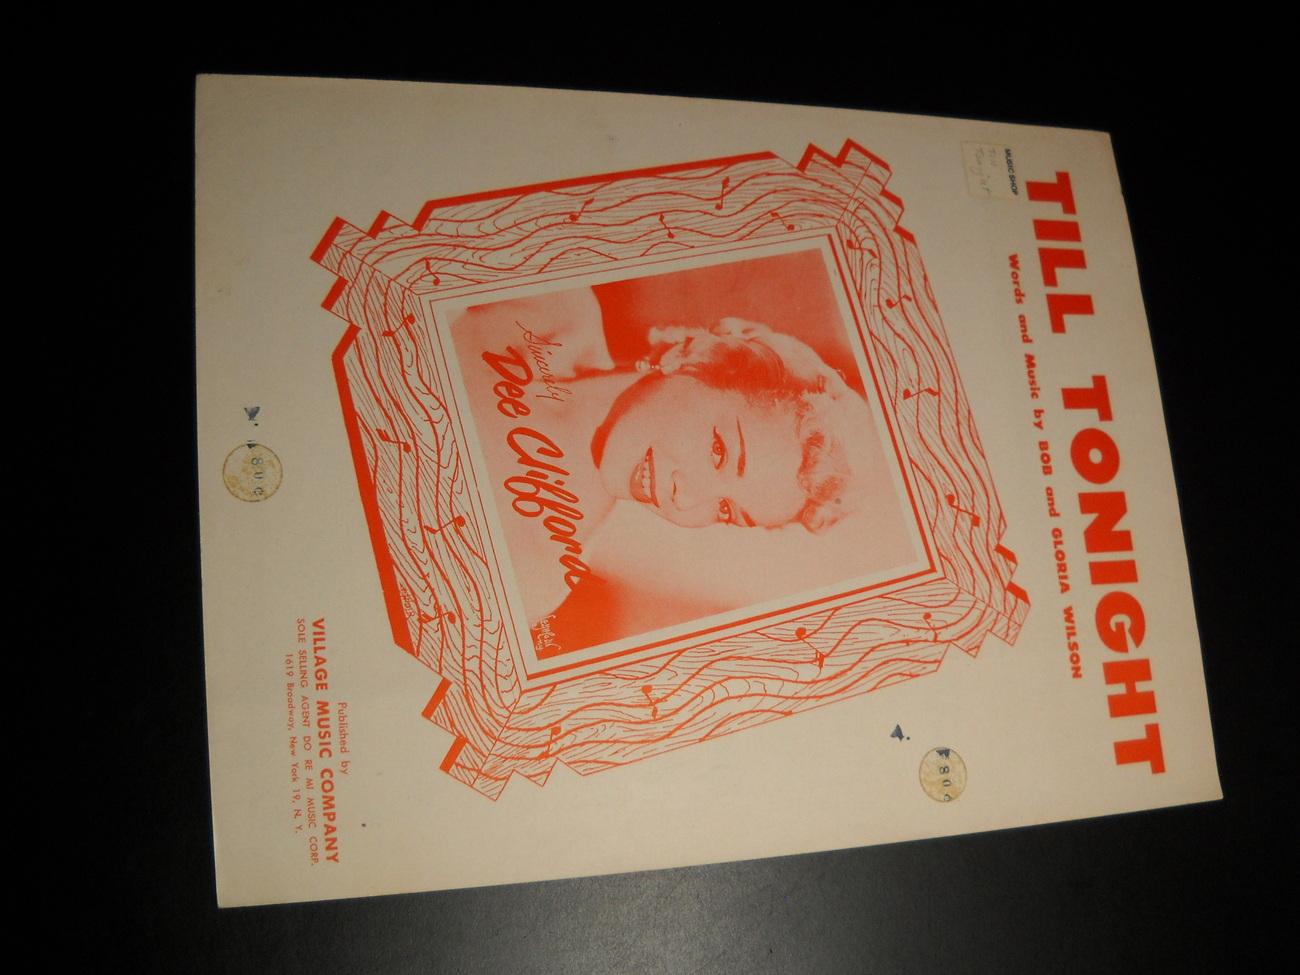 Sheet_music_till_tonight_dee_clifford_bob_gloria_wilson_1940_village_01